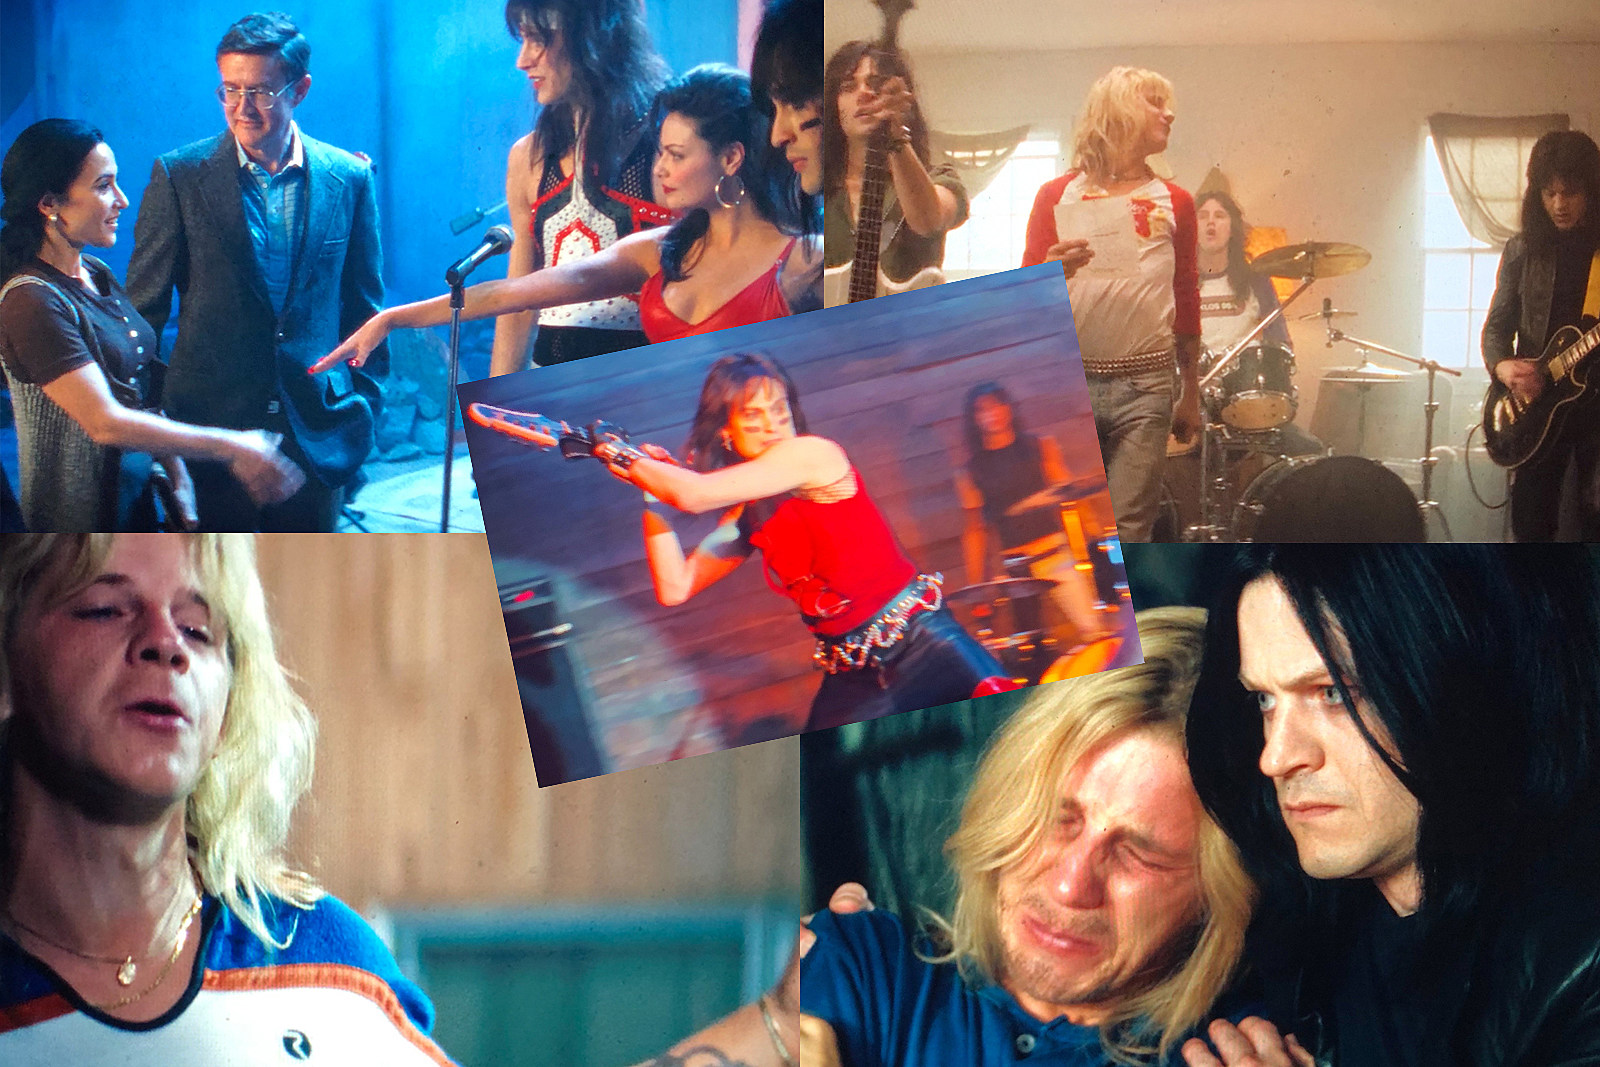 The Five Best Scenes in Motley Crue's 'The Dirt' Movie